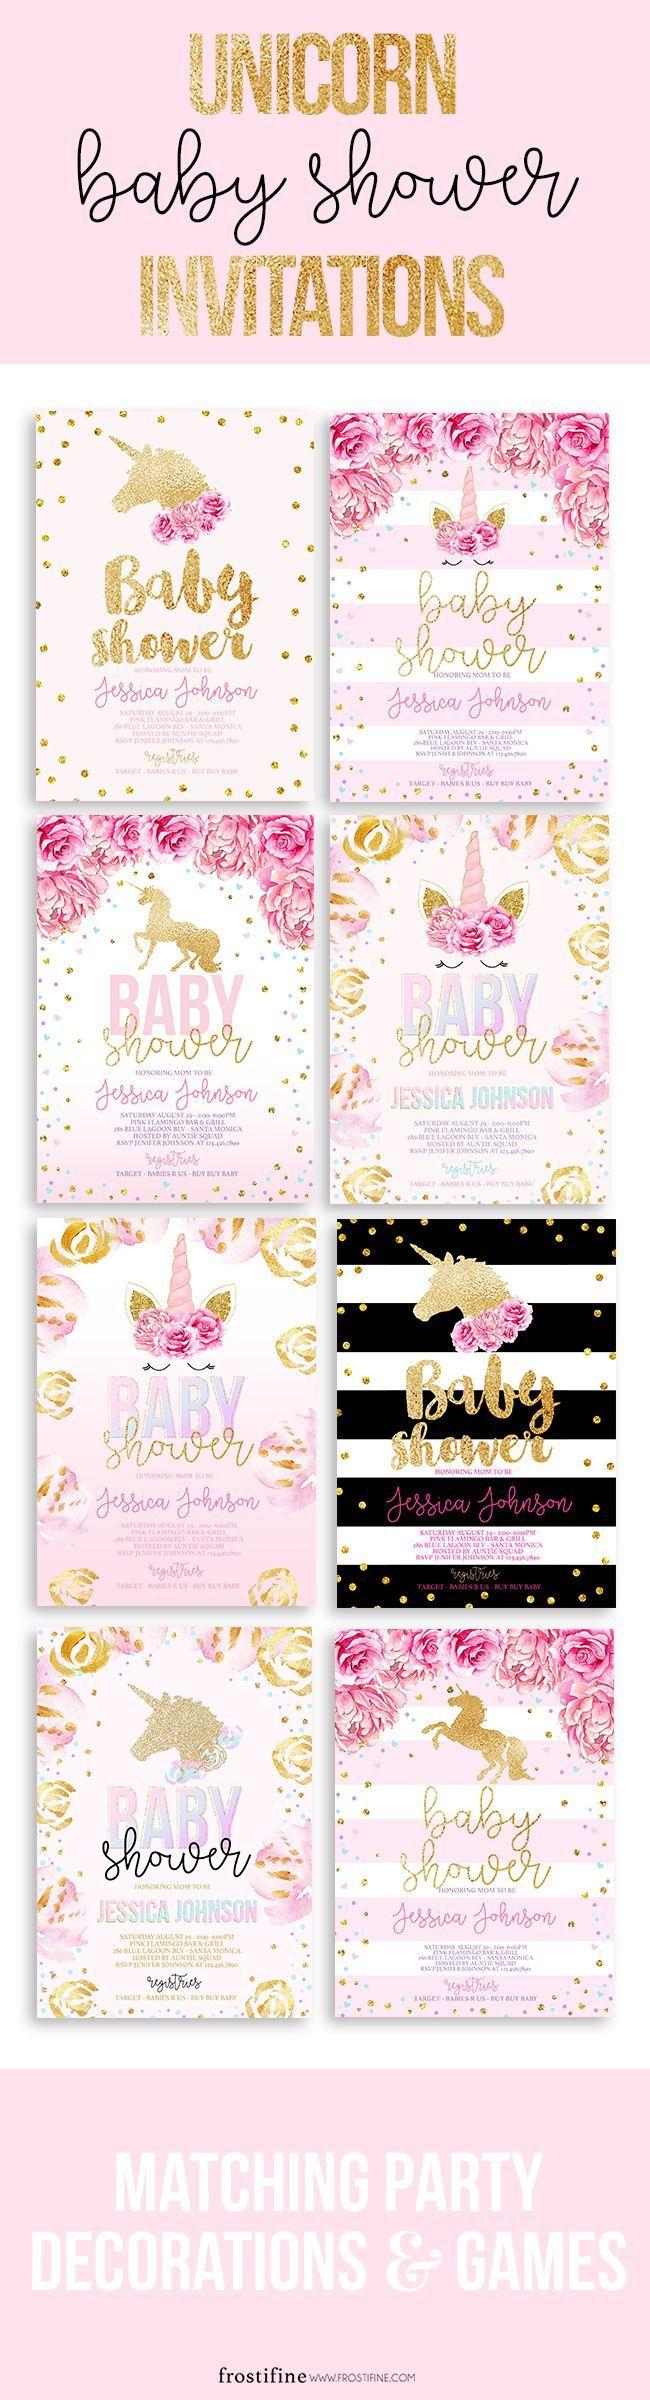 Unicorn baby shower invitations, magical unicorn party decorations, unicorn baby…